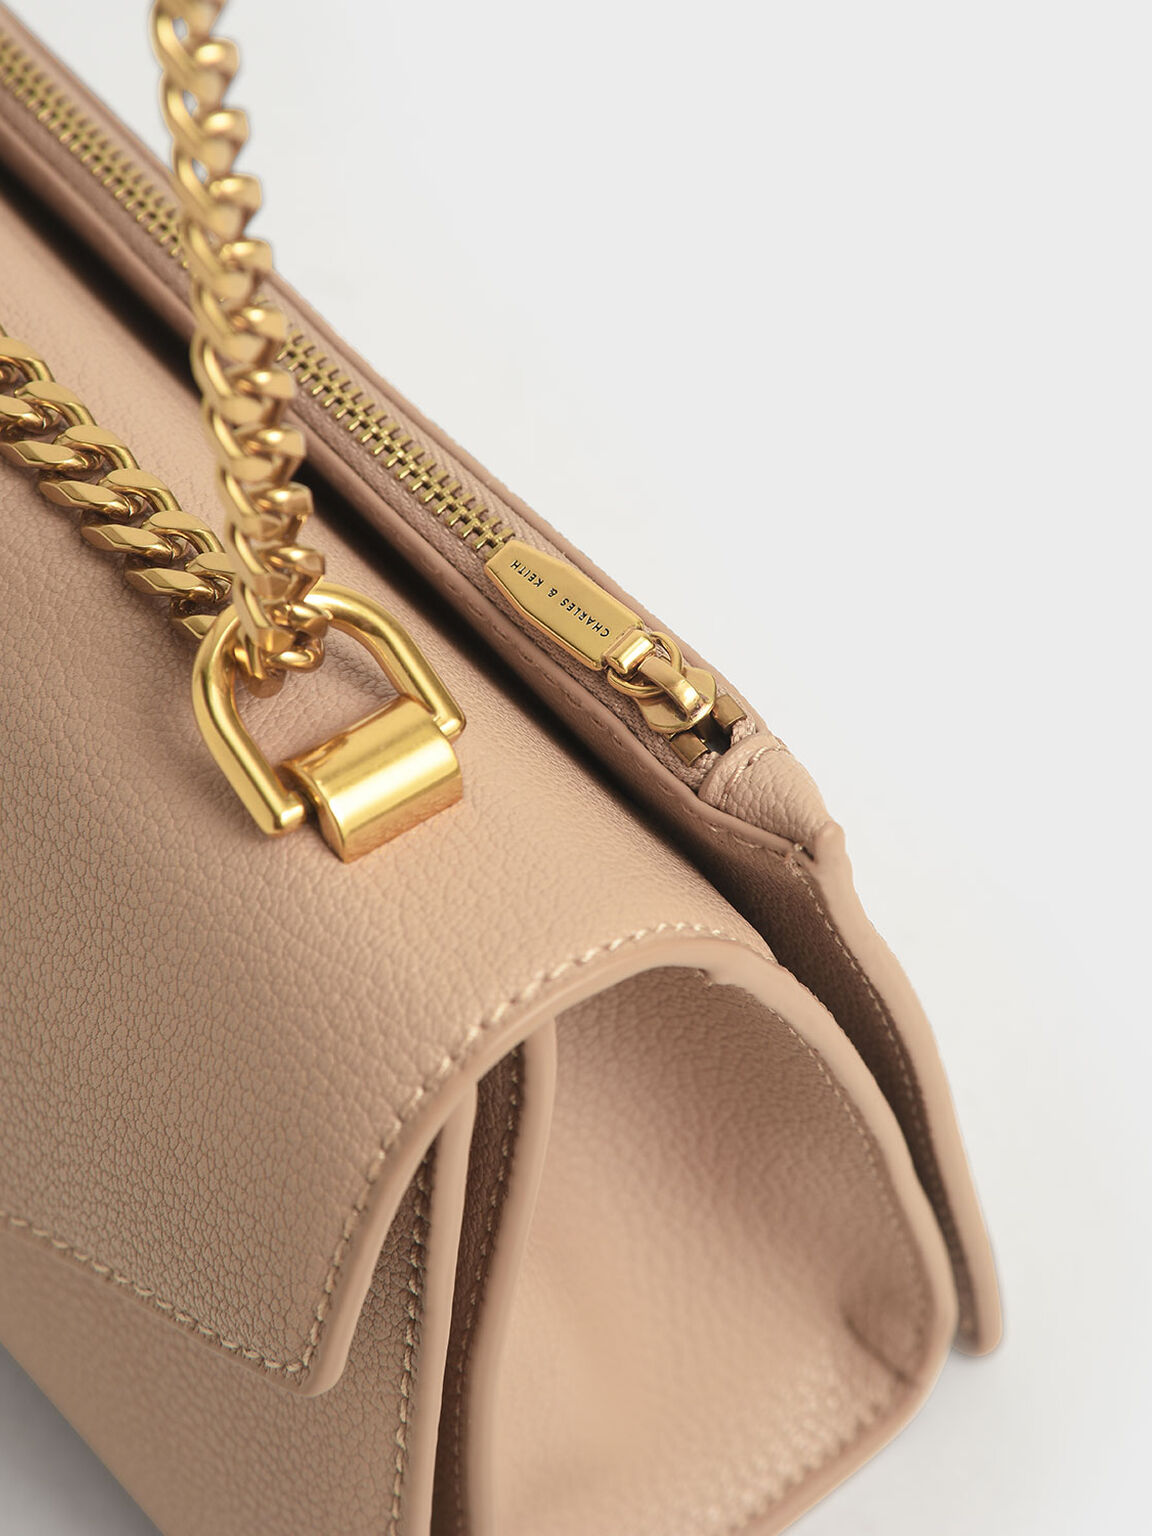 Turn-Lock Crossbody Bag, Beige, hi-res